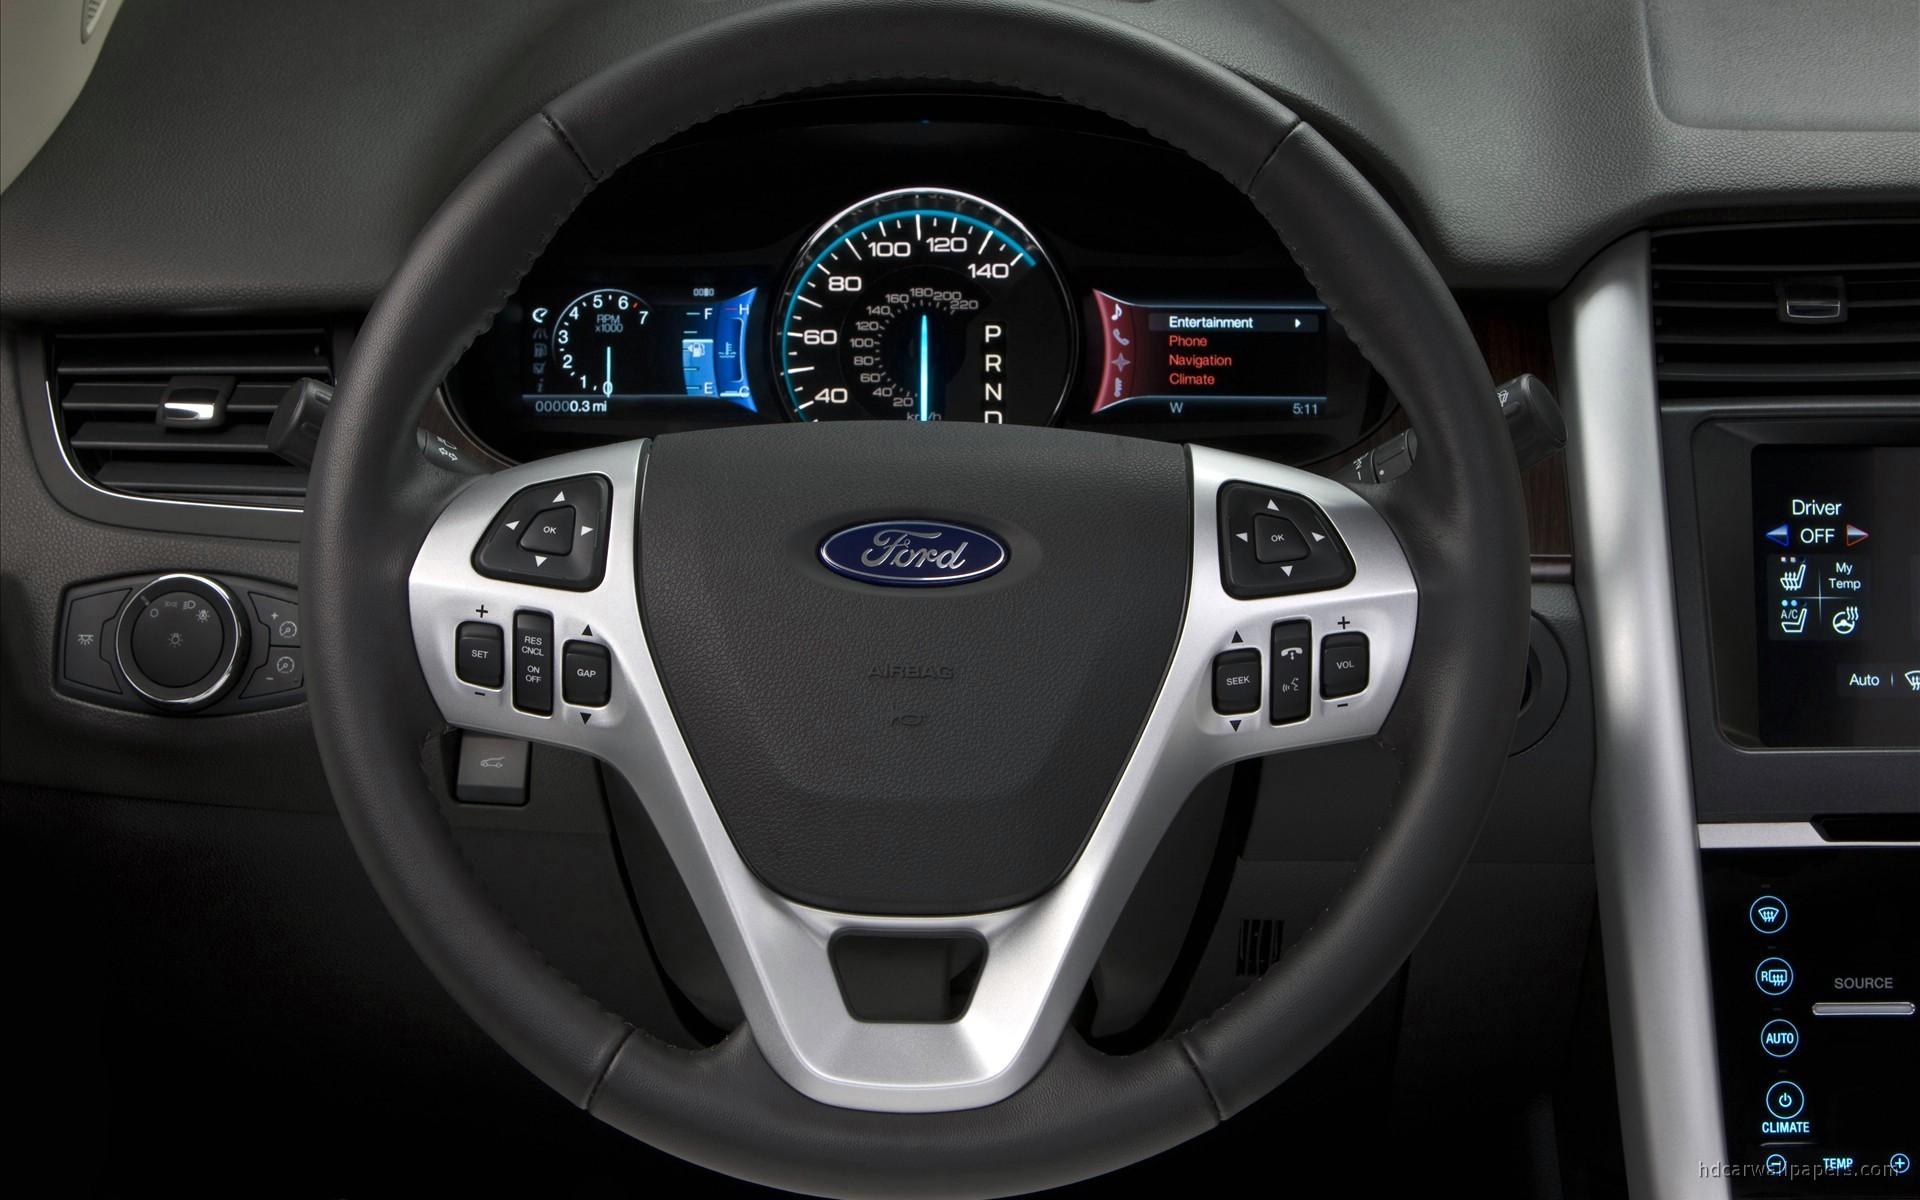 2011 Ford Edge Interior Wallpaper Hd Car Wallpapers Id